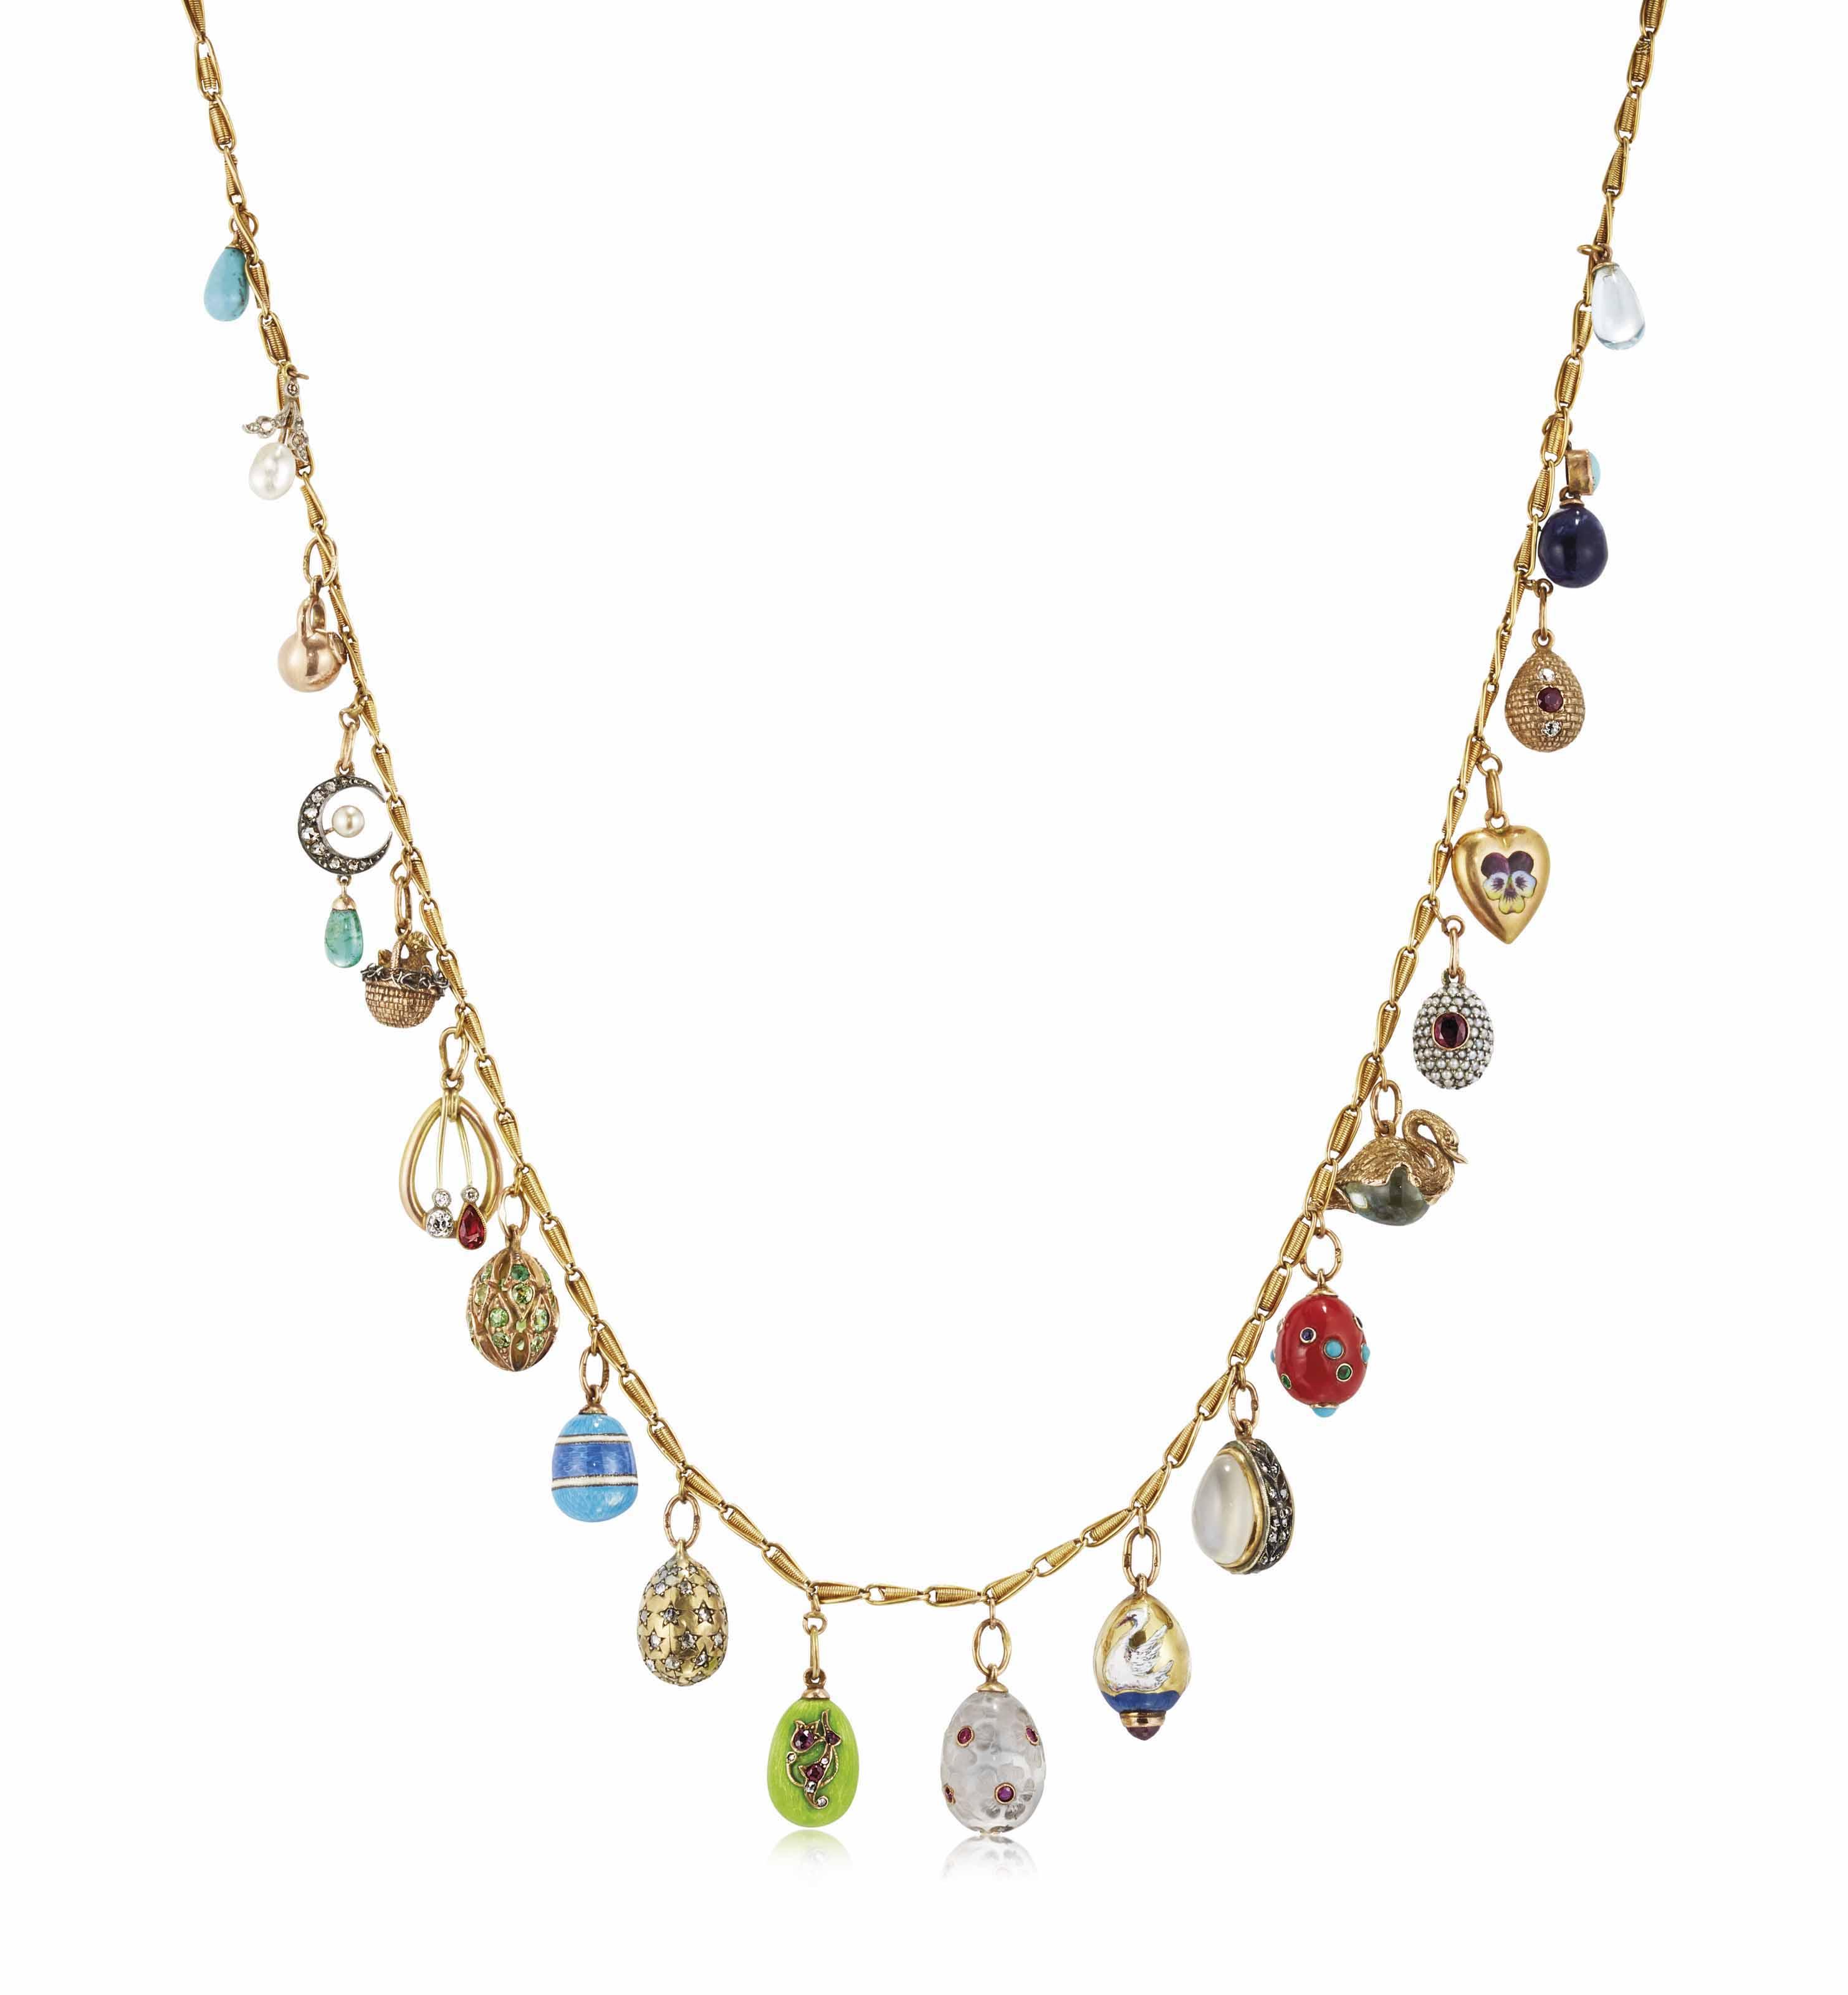 A NECKLACE OF TWENTY JEWELLED, GOLD, HARDSTONE AND GUILLOCHÉ ENAMEL EGG PENDANTS